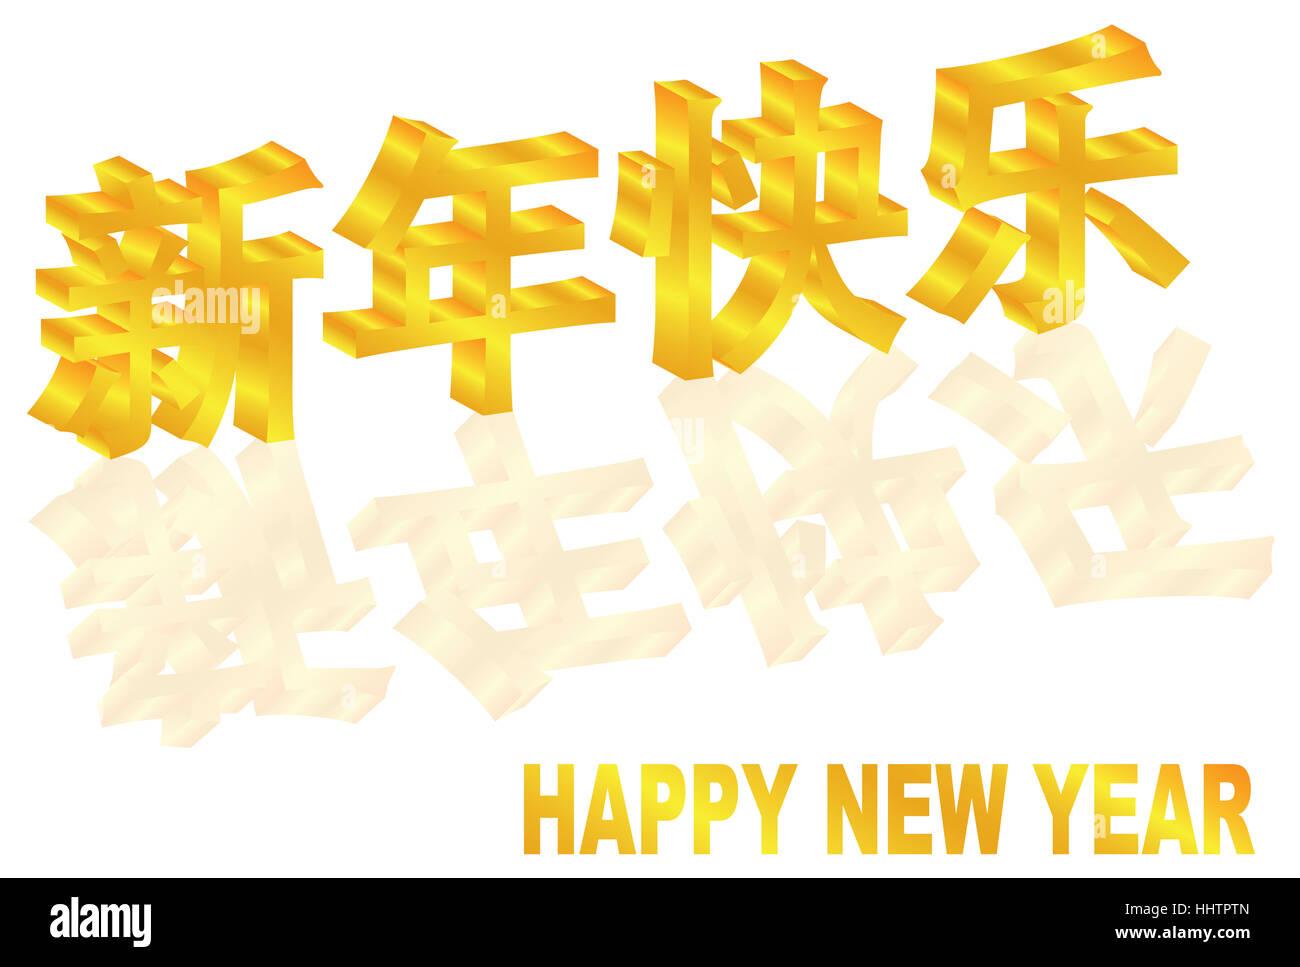 New Year Card Wishes Stockfotos & New Year Card Wishes Bilder - Alamy